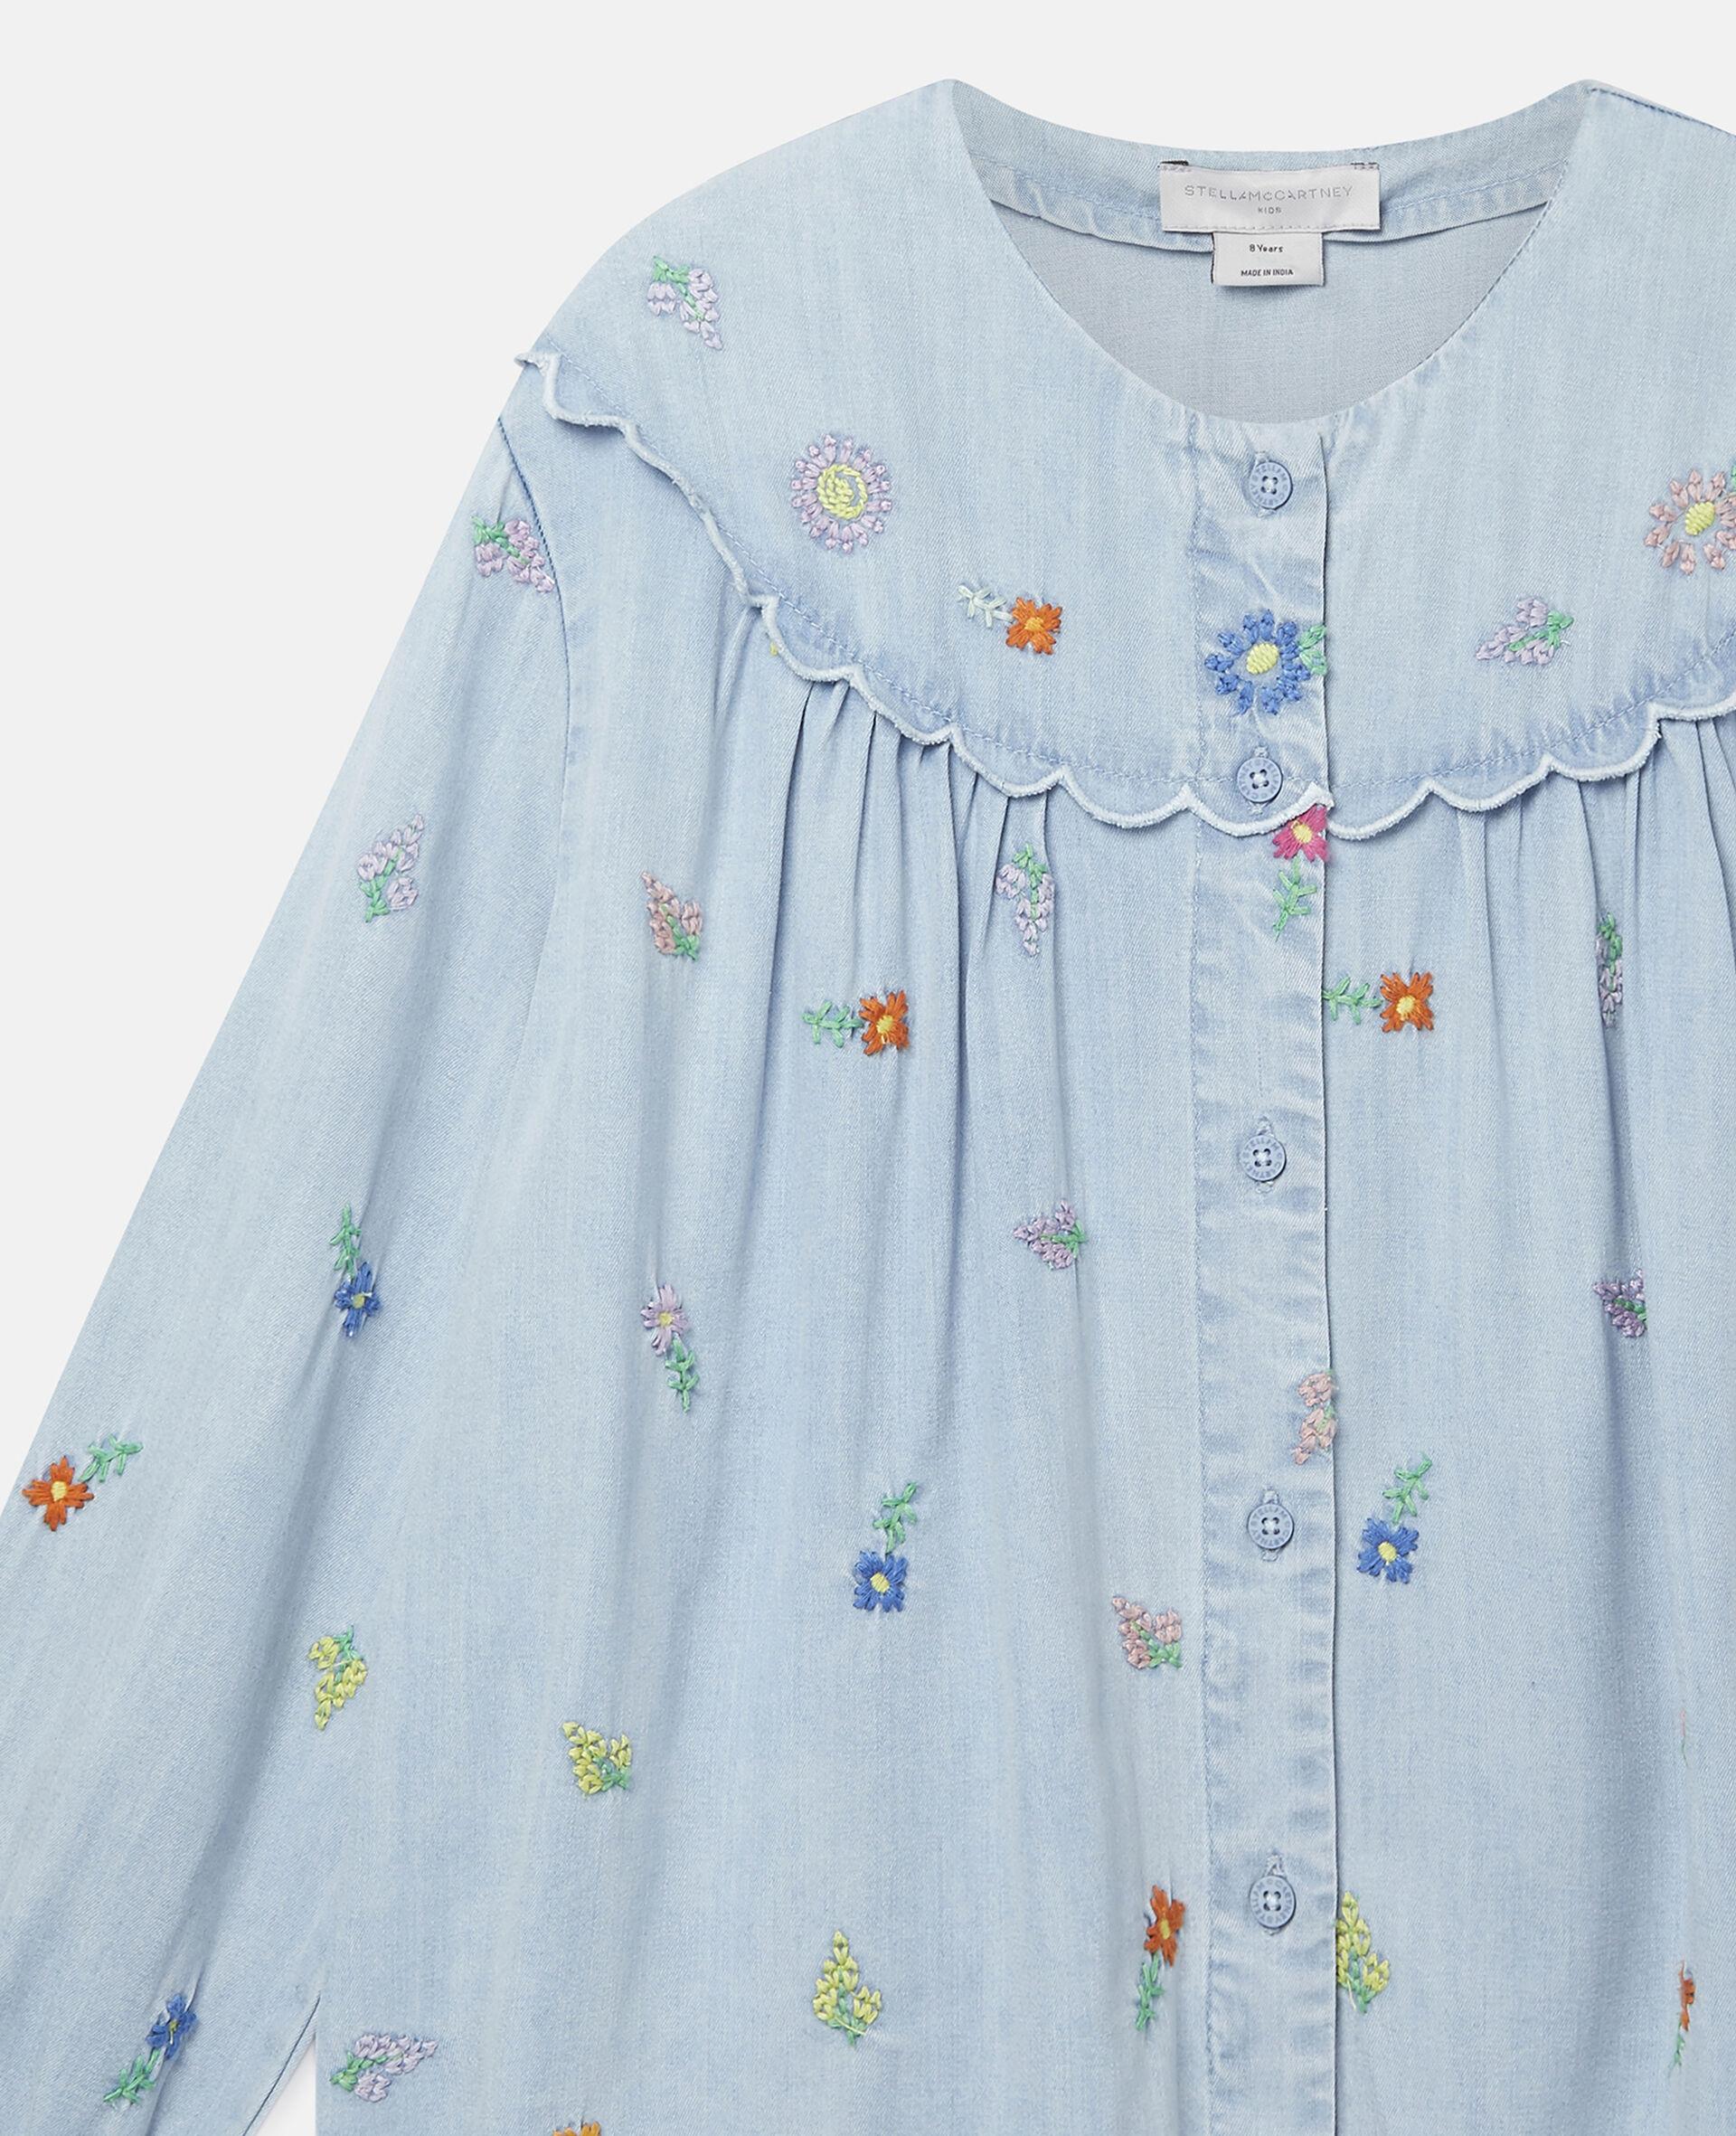 Chemise en denim à fleurs brodées-Bleu-large image number 2